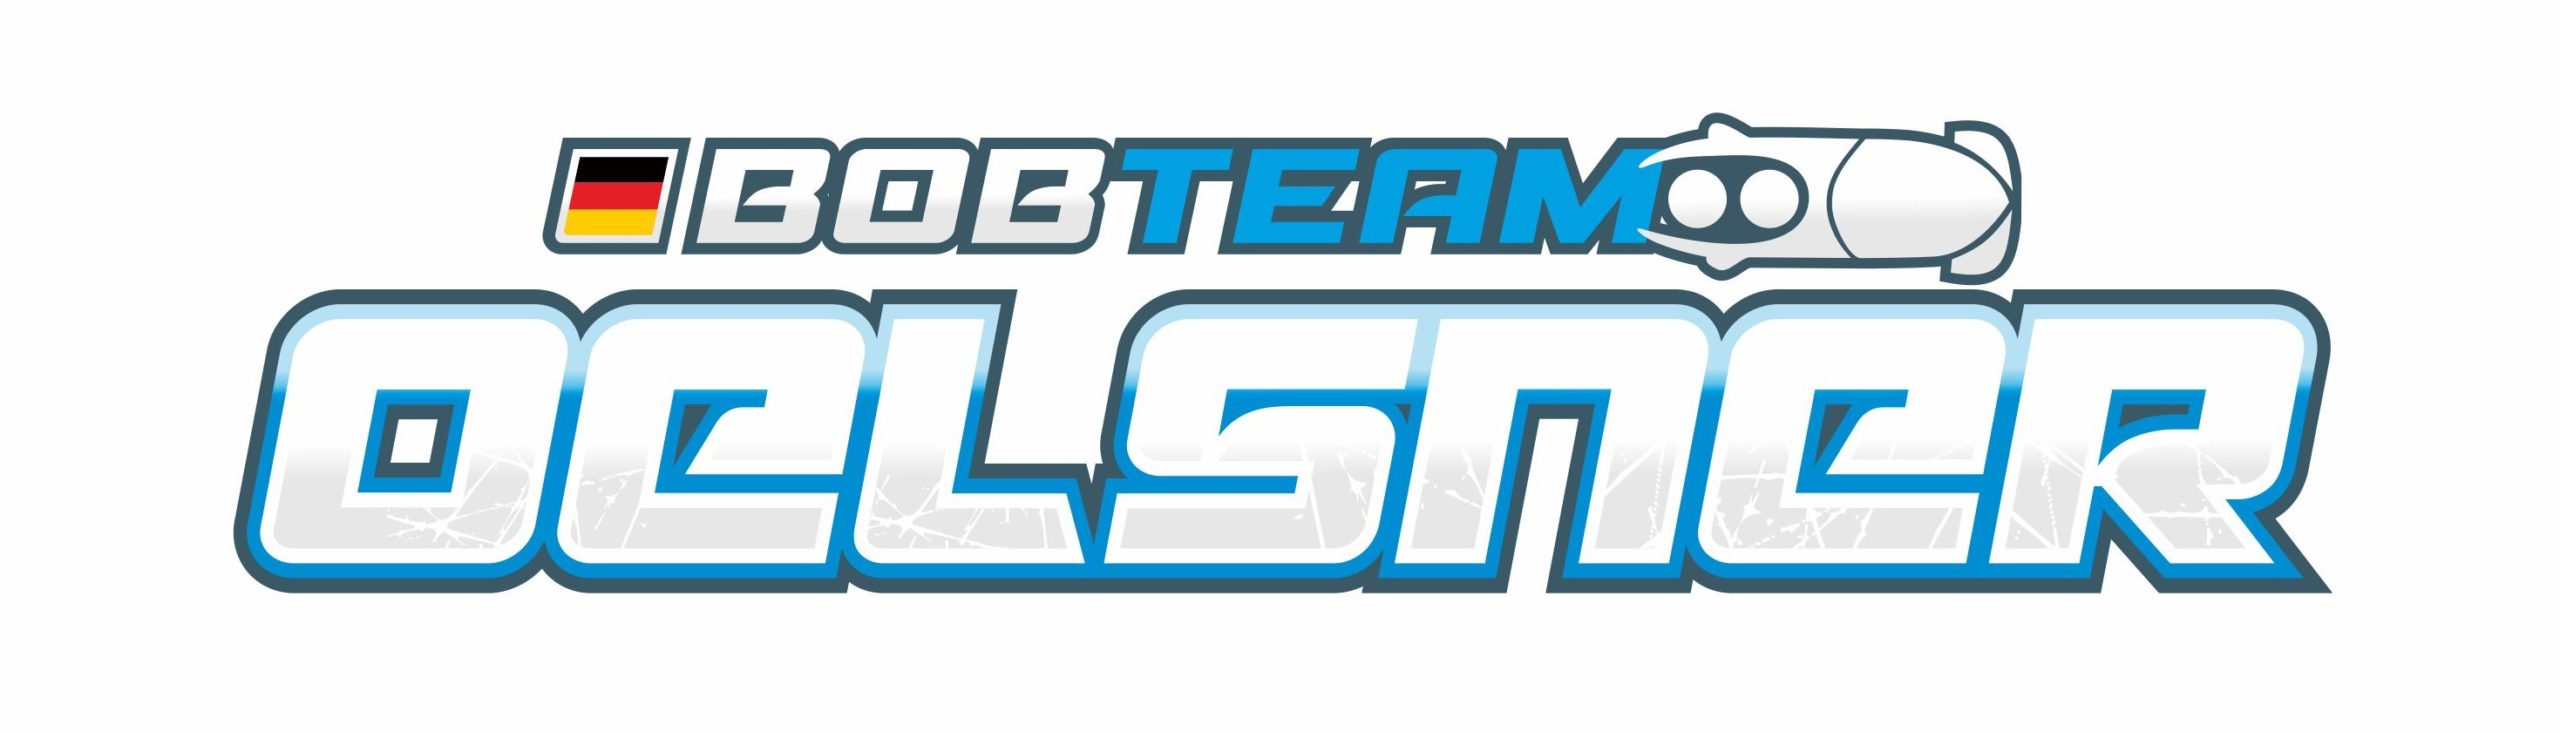 logo_bobteam-oelsner_endfassung_weisserBG